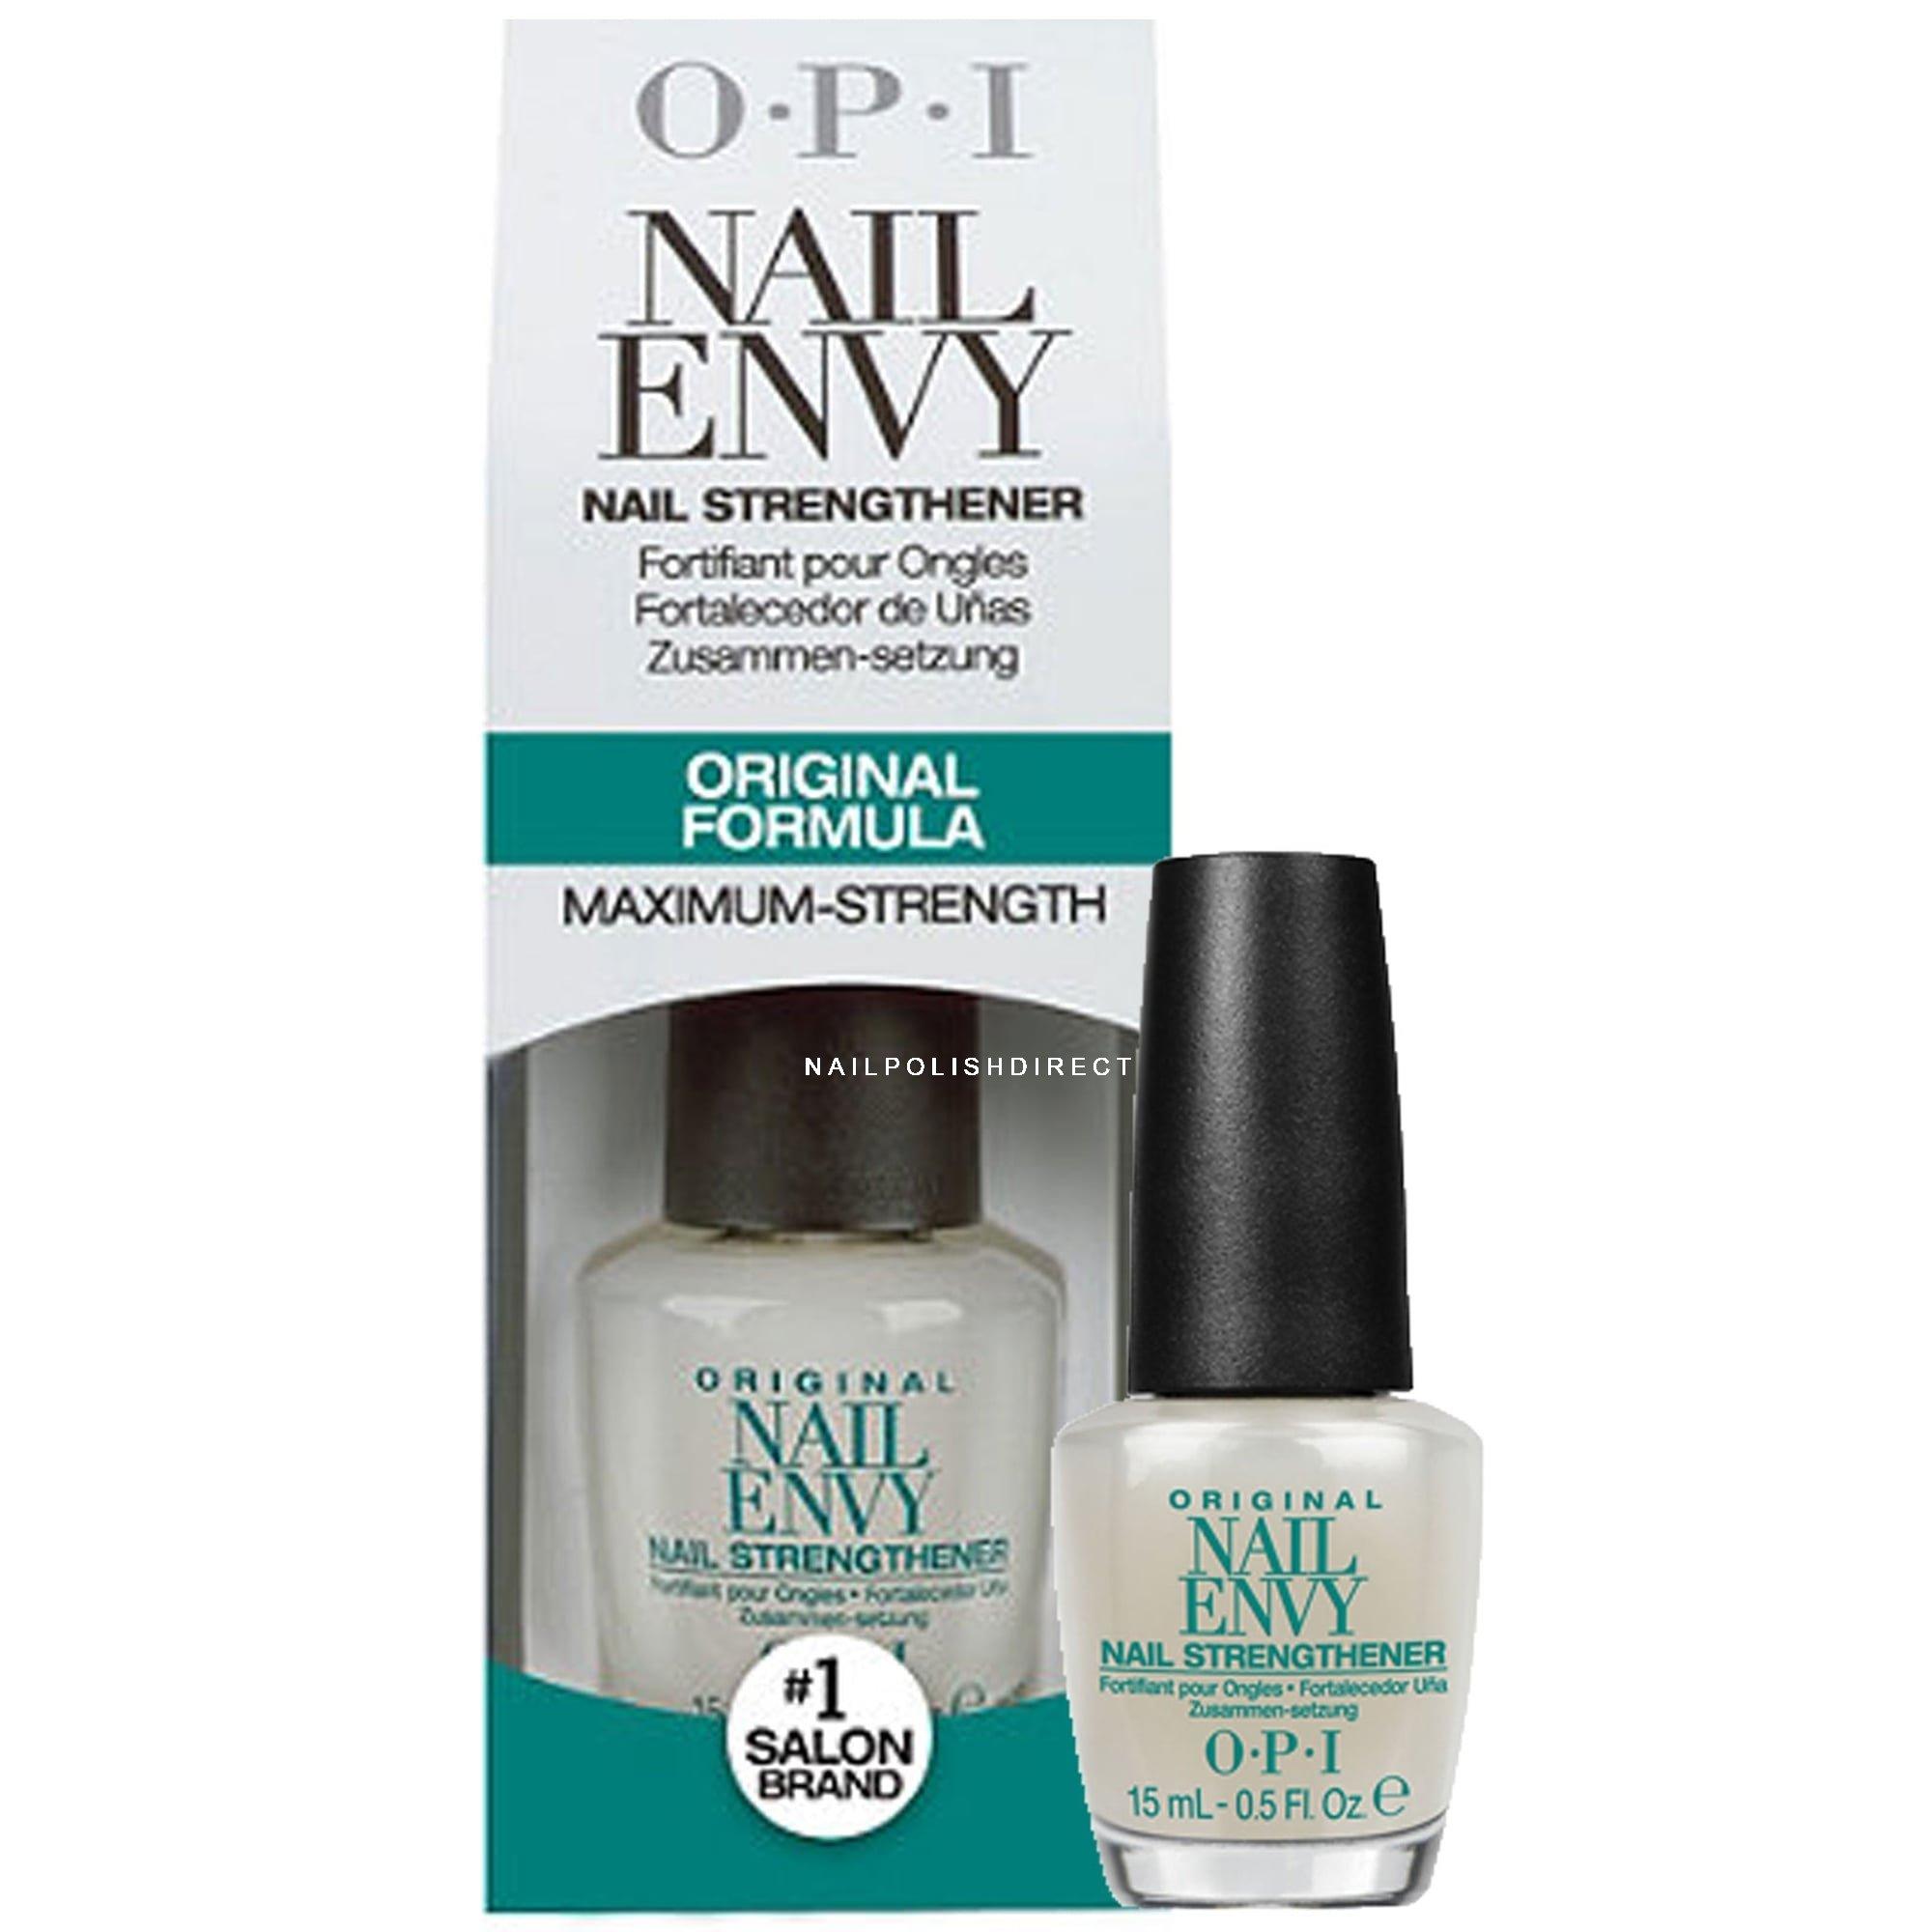 Opi Nail Envy Nail Treatment Original Nail Strengthener Formula Maximum Strength 15ml